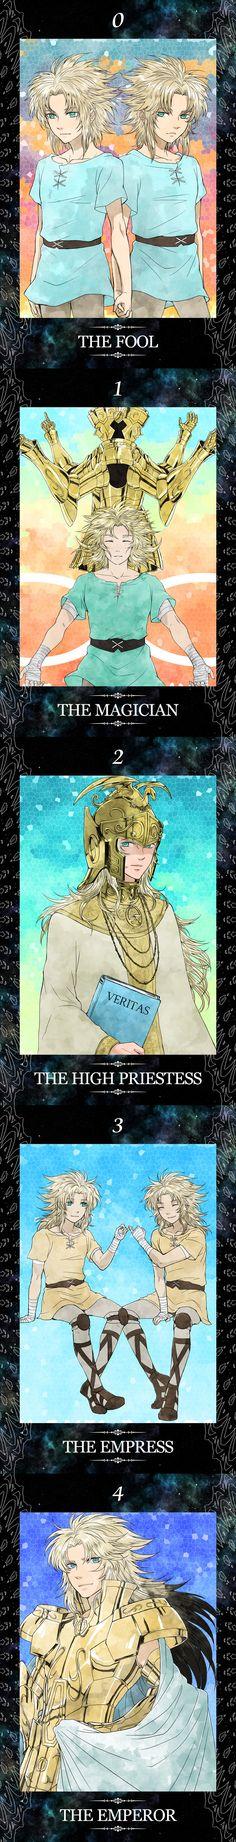 Part One Saint Seiya Gemini Story Tarot Cards